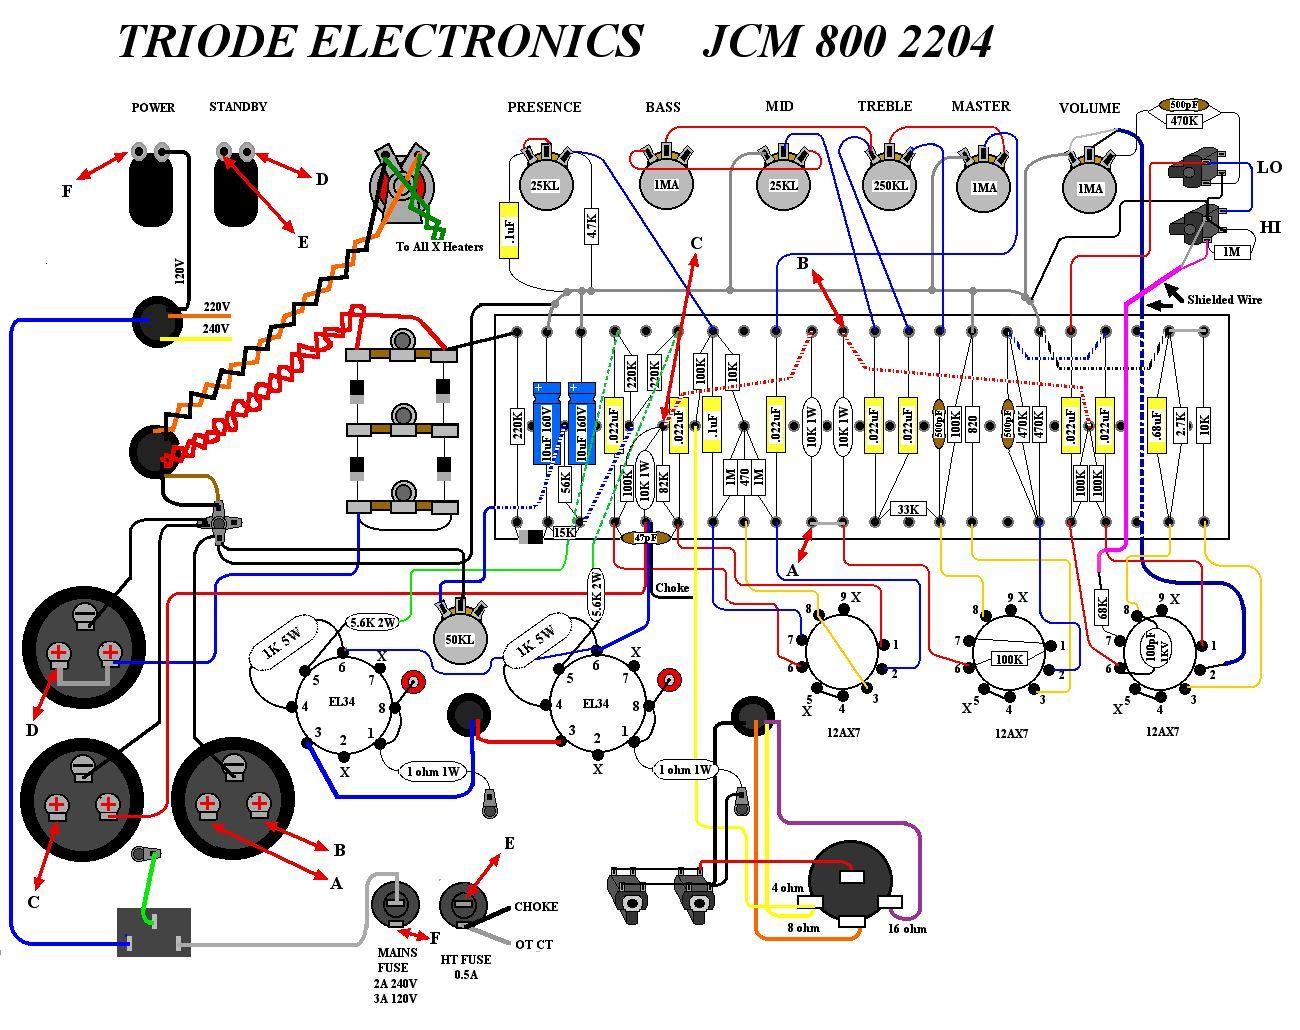 marshall jcm800 2204a 50w tube diy amp kit version 1 diy guitar amp diy guitar [ 1300 x 1030 Pixel ]